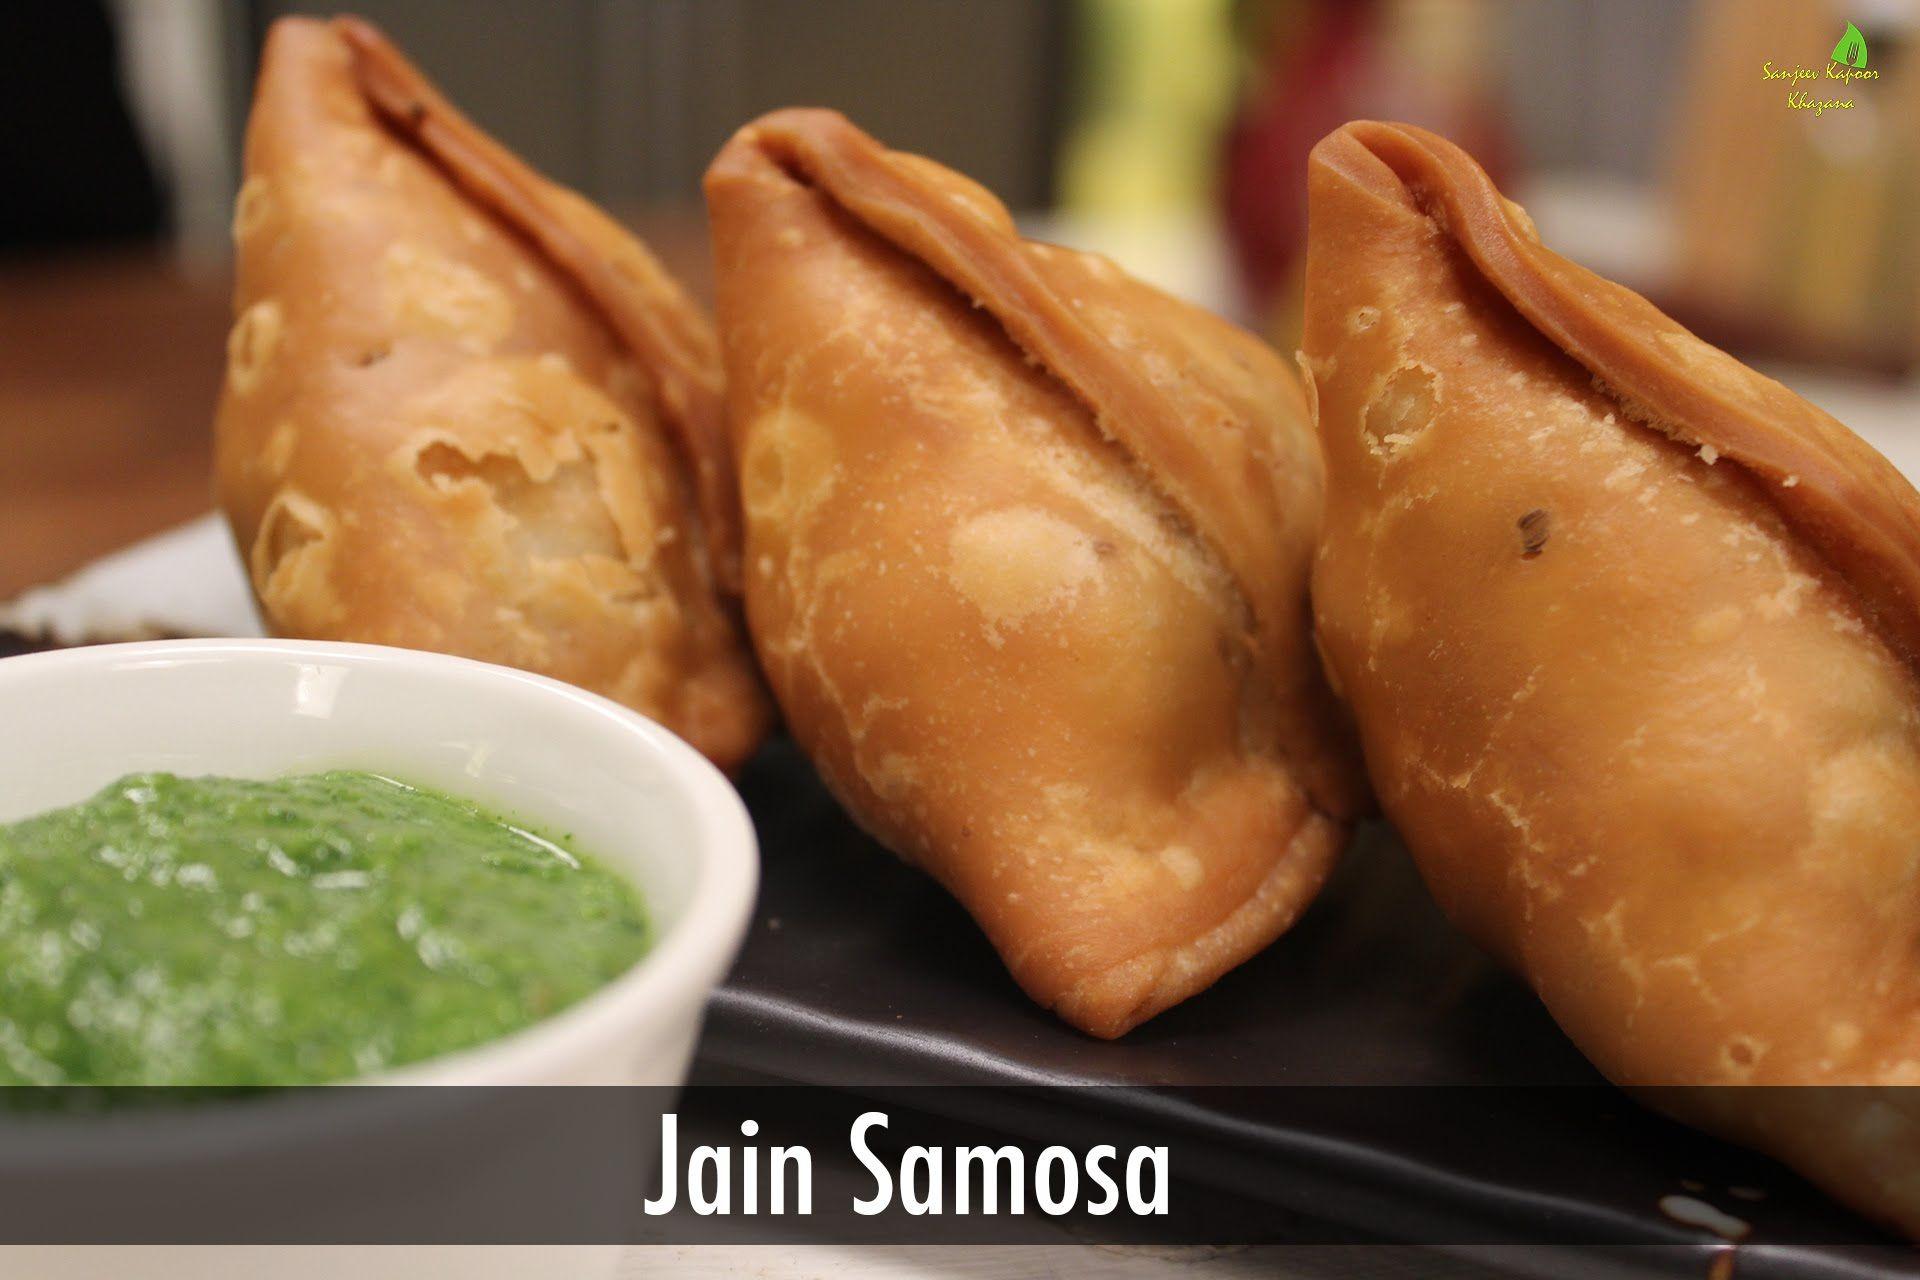 Jain samosa jain recipes sanjeev kapoor khazana sanjeev kapoor jain samosa jain recipes sanjeev kapoor khazana forumfinder Choice Image